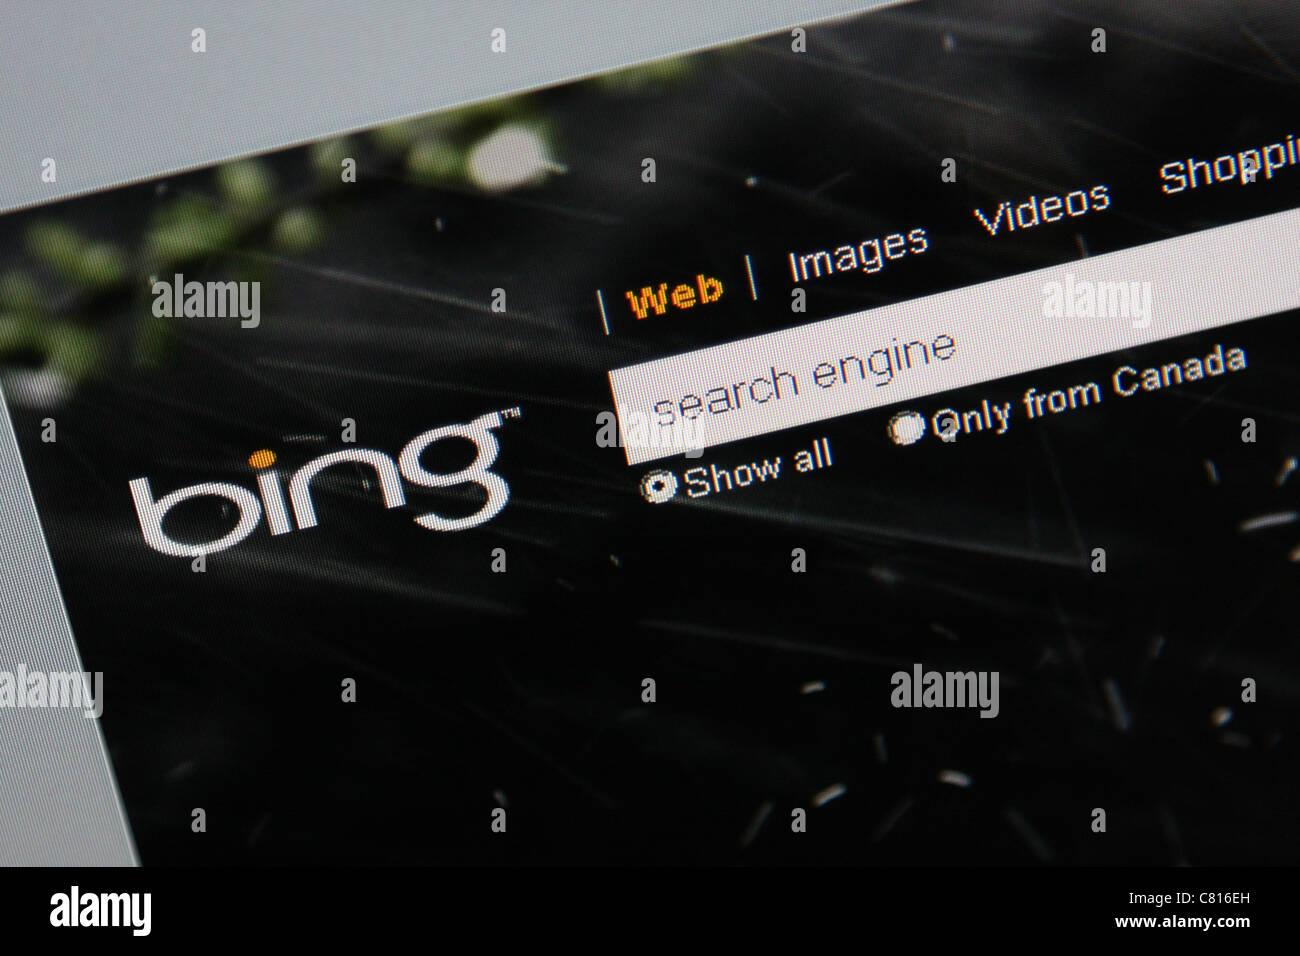 bing microsoft search engine screenshot - Stock Image